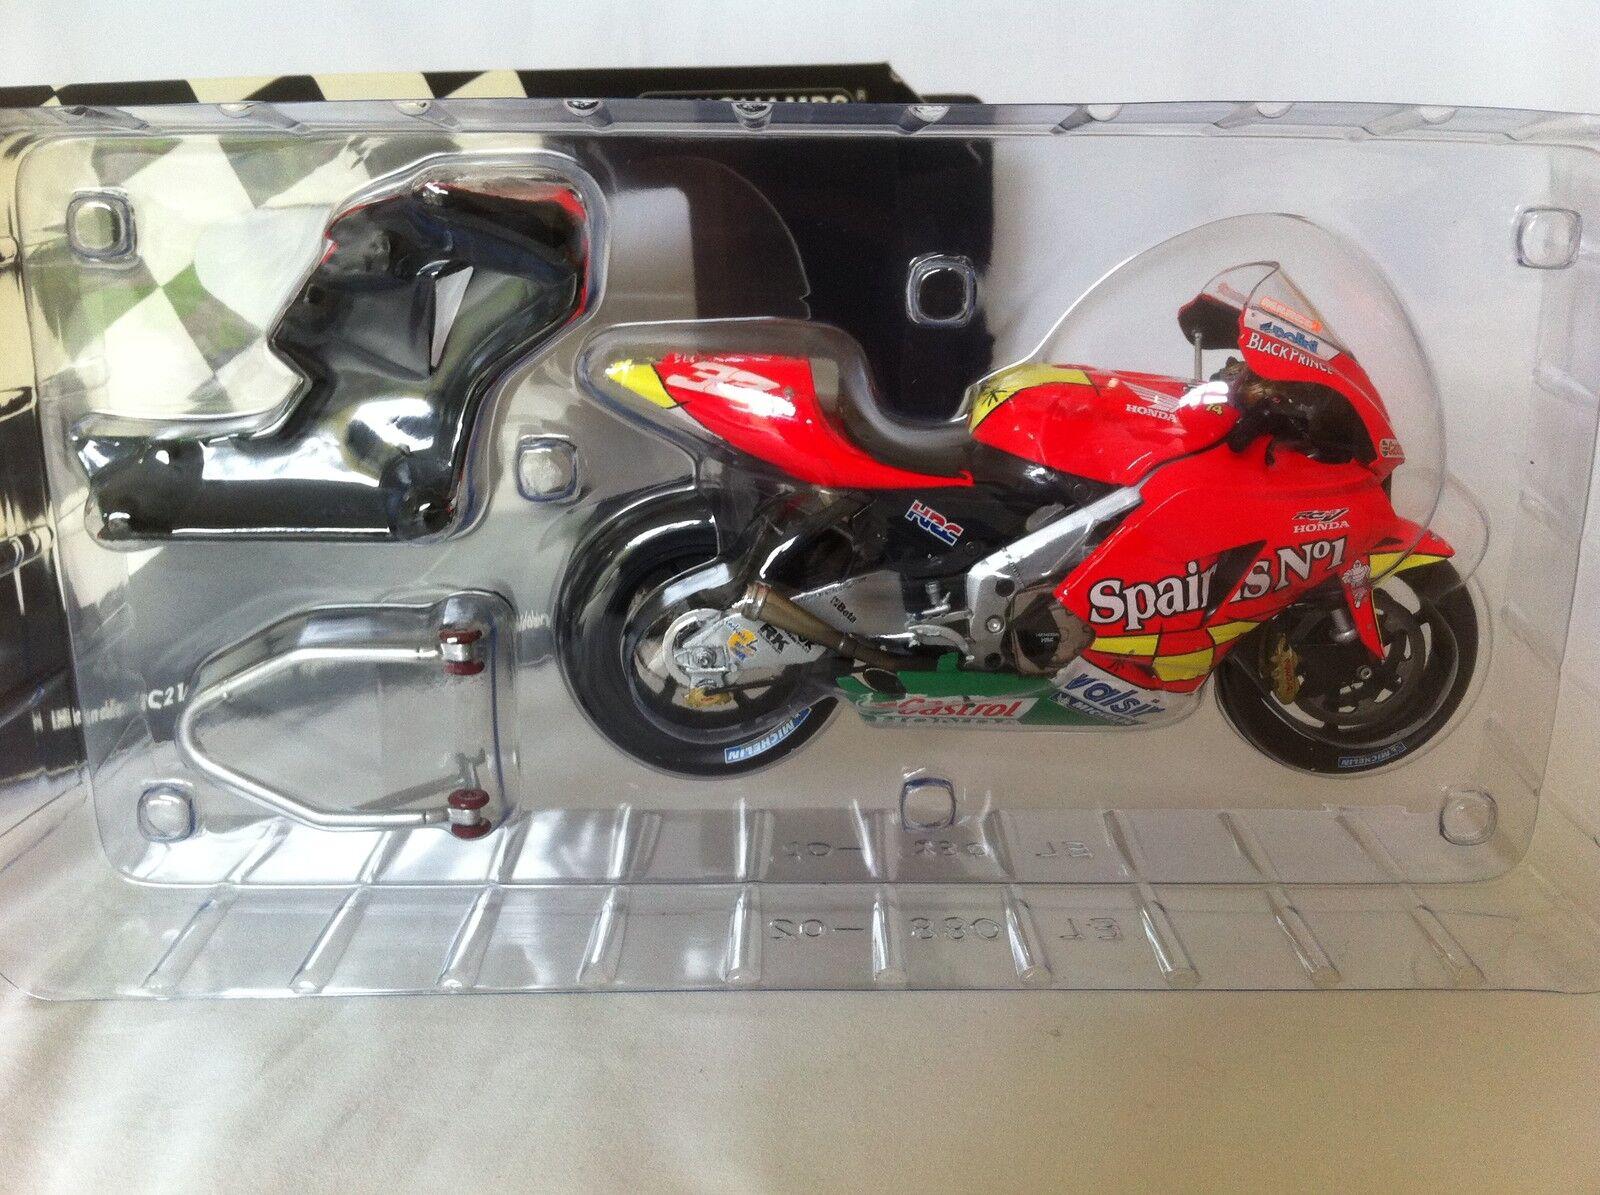 Minichamps 1.12 Scale M.Melandri Honda RC211V.Team Spain& 039;s No1 Honda MOTOGP 06.